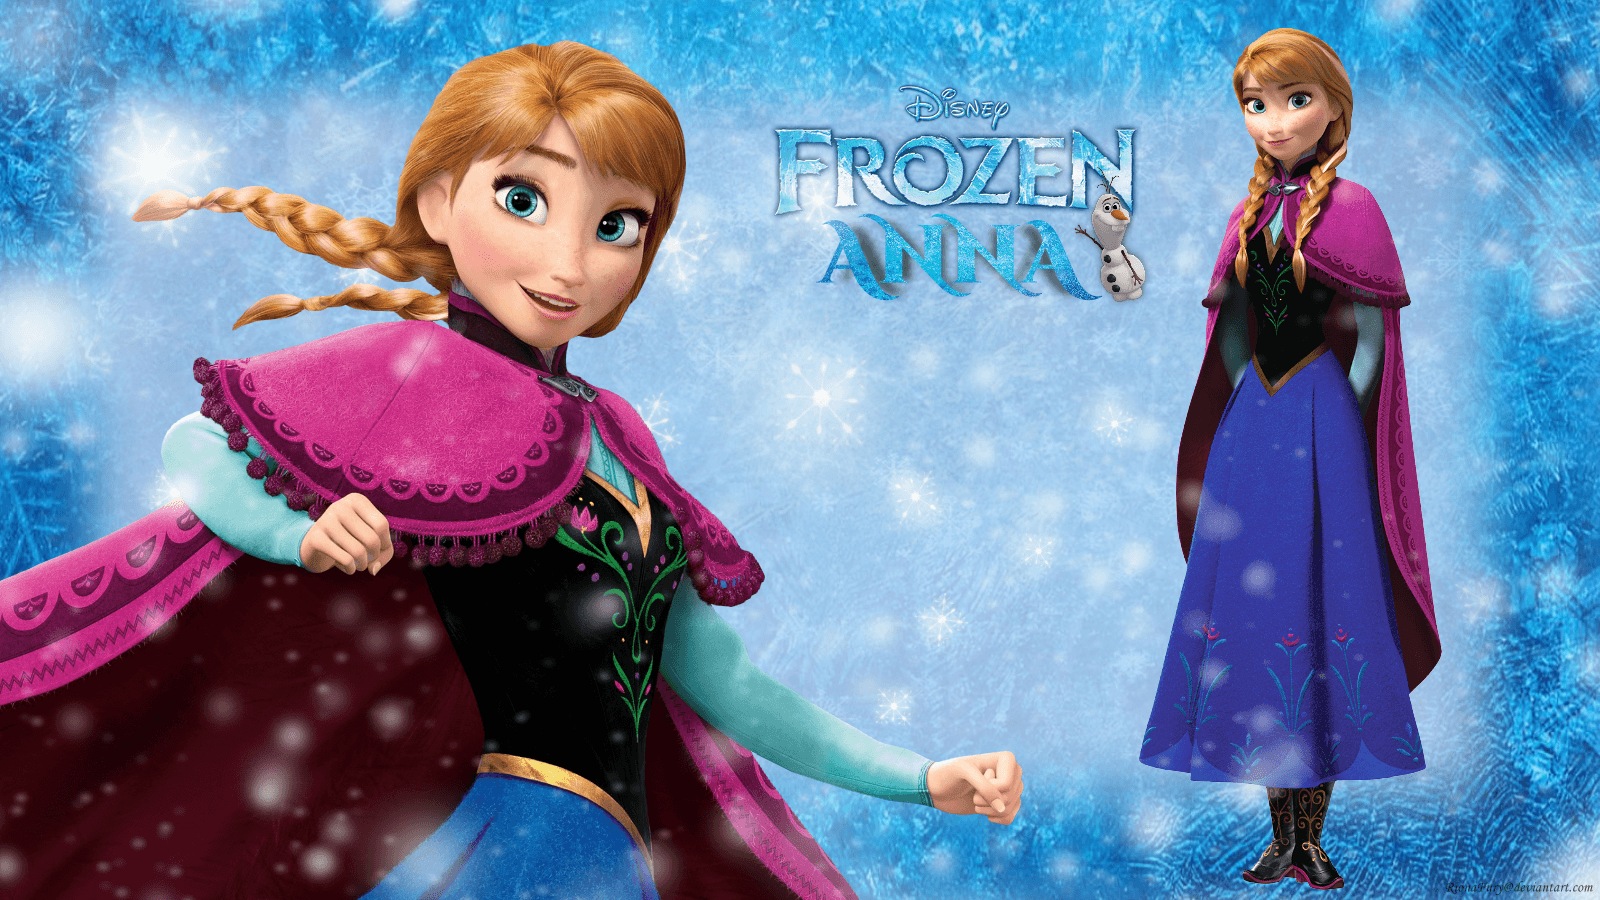 Anna Frozen Wallpapers - Top Free Anna